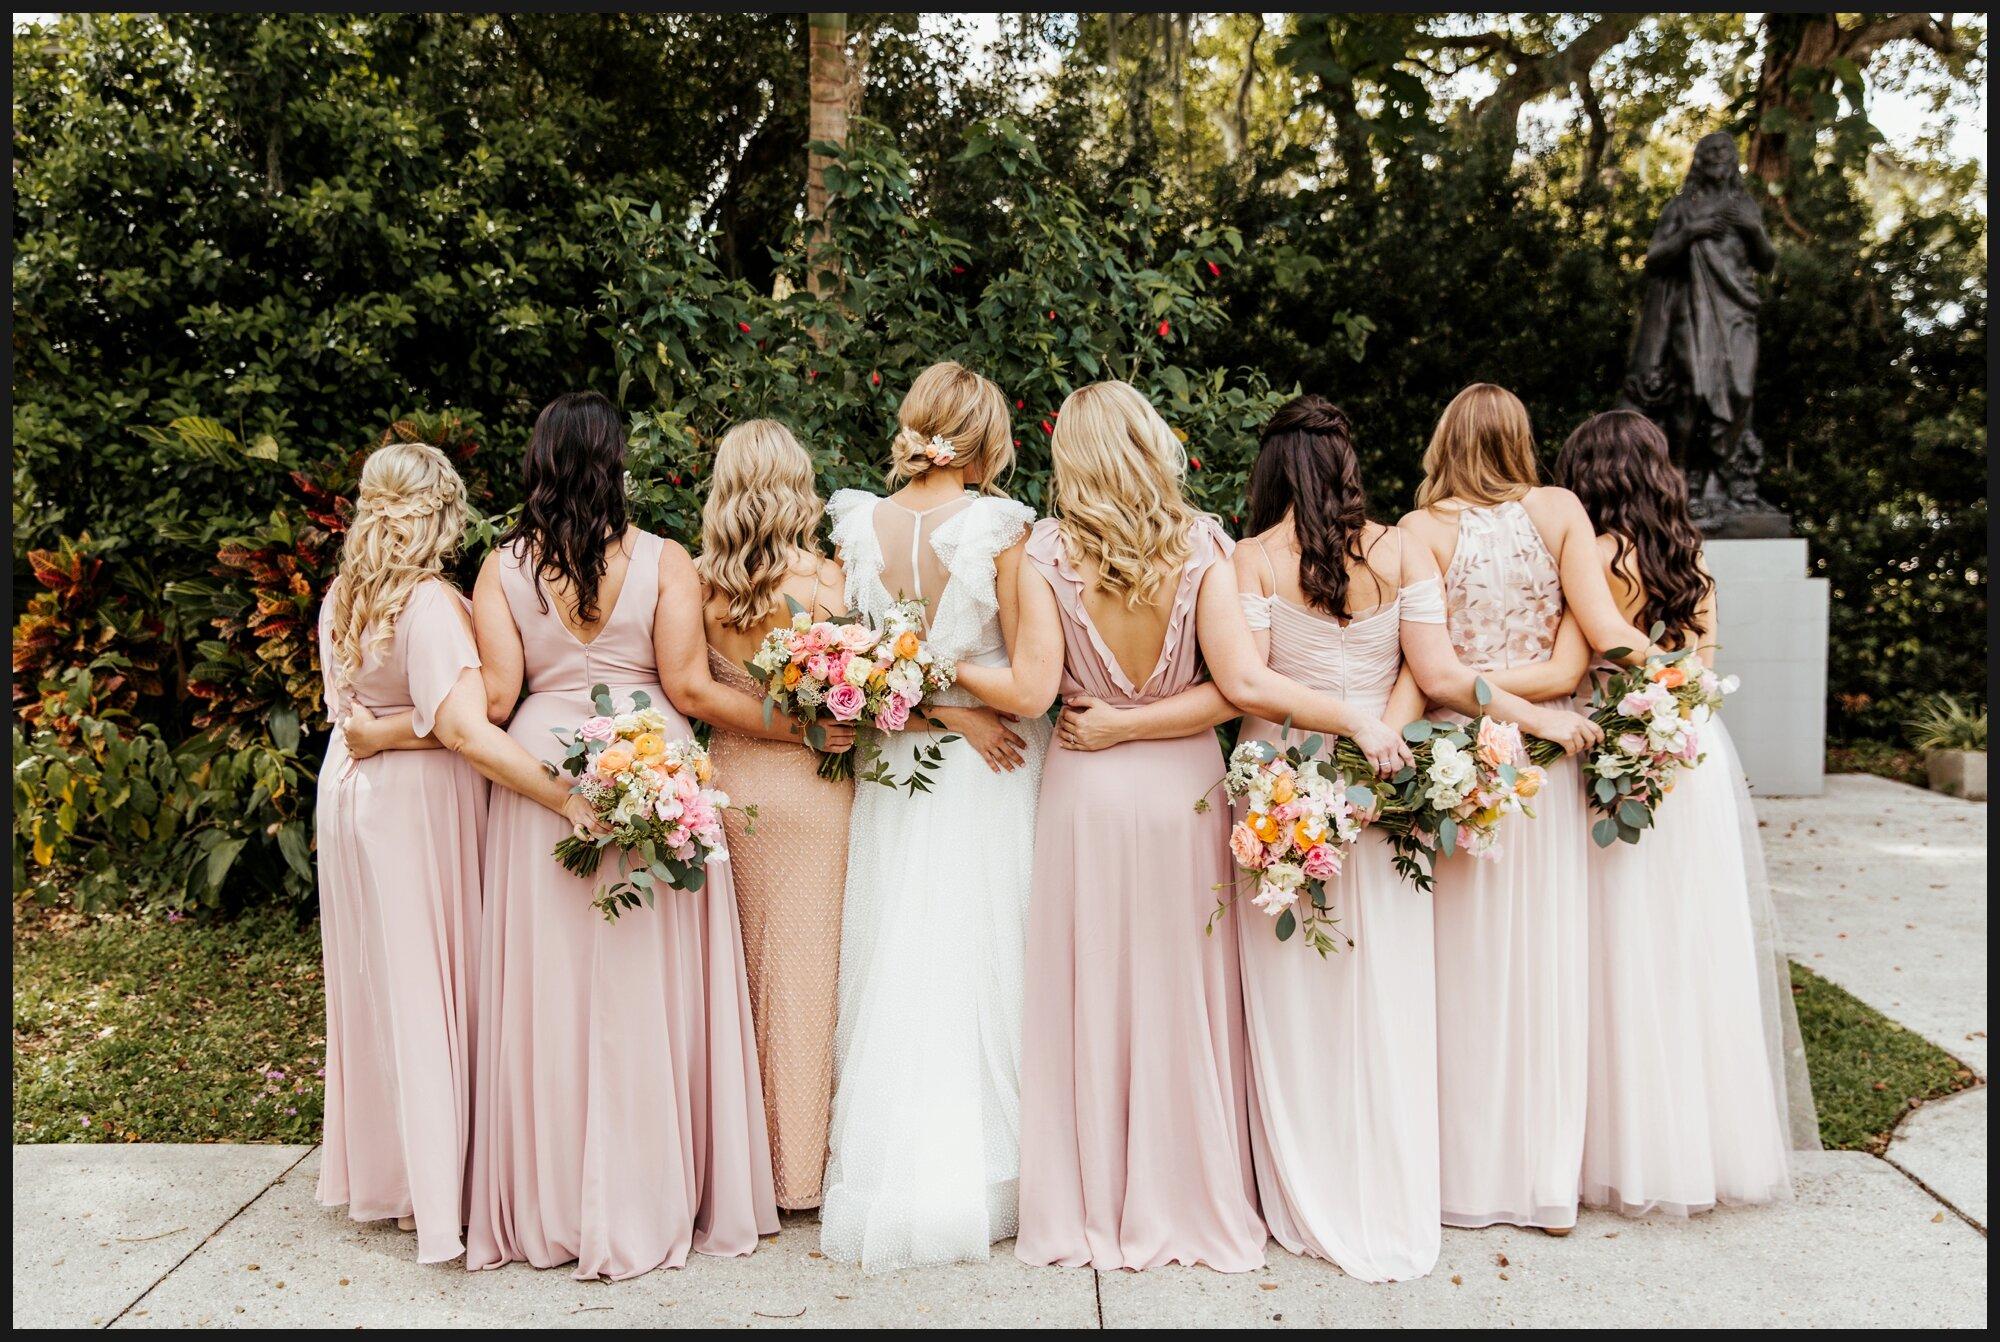 Orlando-Wedding-Photographer-destination-wedding-photographer-florida-wedding-photographer-hawaii-wedding-photographer_0745.jpg